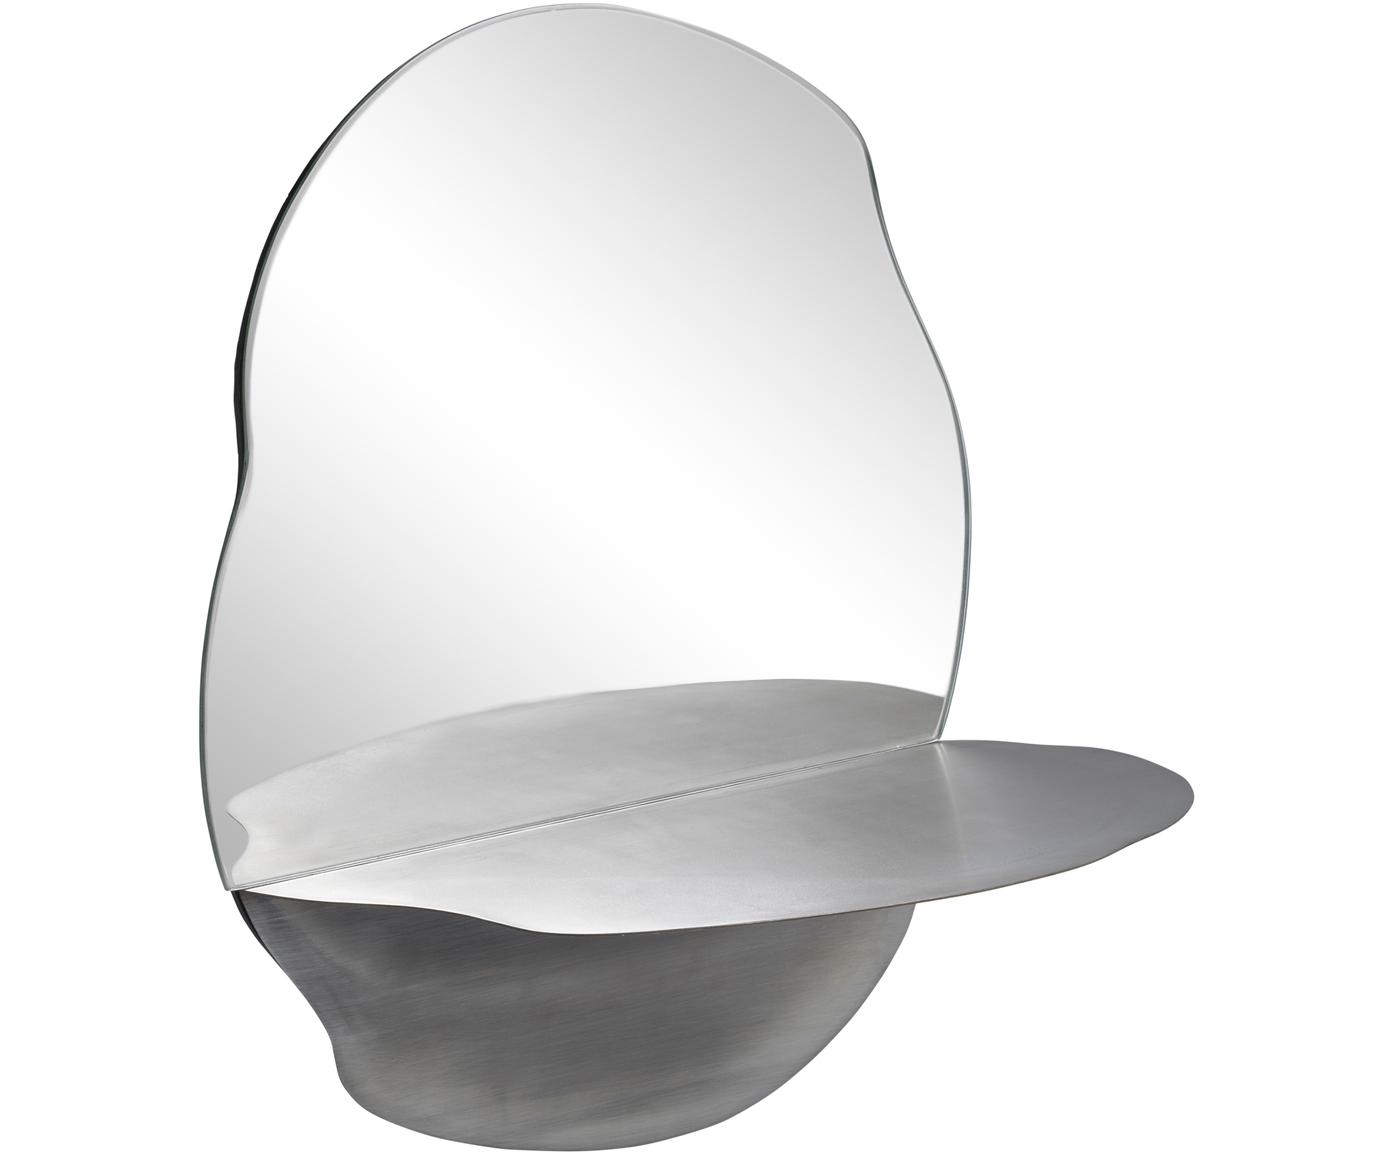 Espejo de pared Vilja, con estante, Espejo: cristal, Estante: metal look óxido, Metal mate, An 31 x Al 40 cm